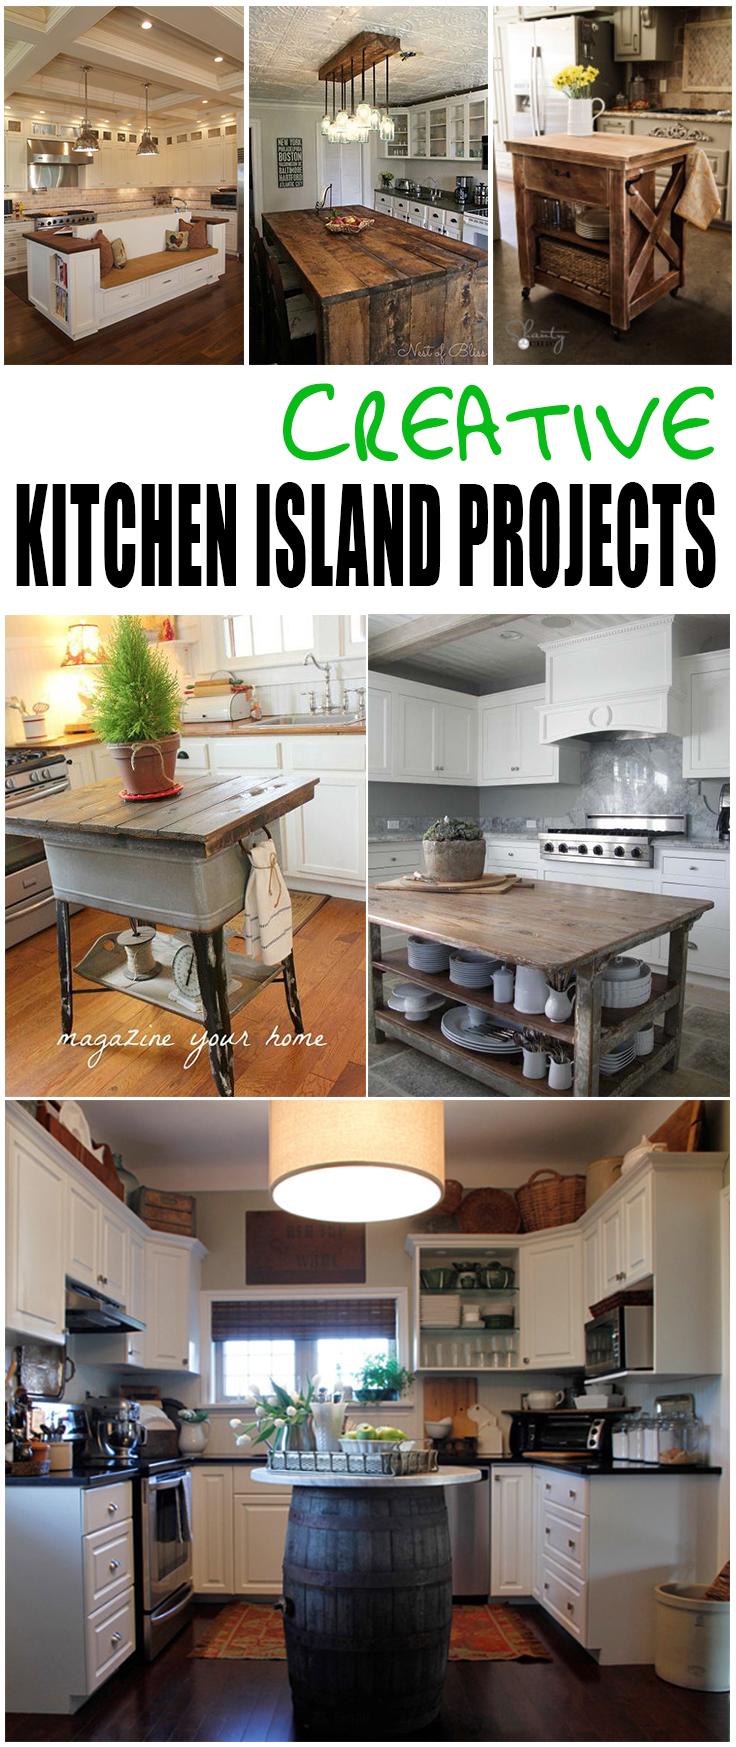 14 diy kitchen island ideas page 12 of 15 picky stitch - Diy kitchen ideas ...